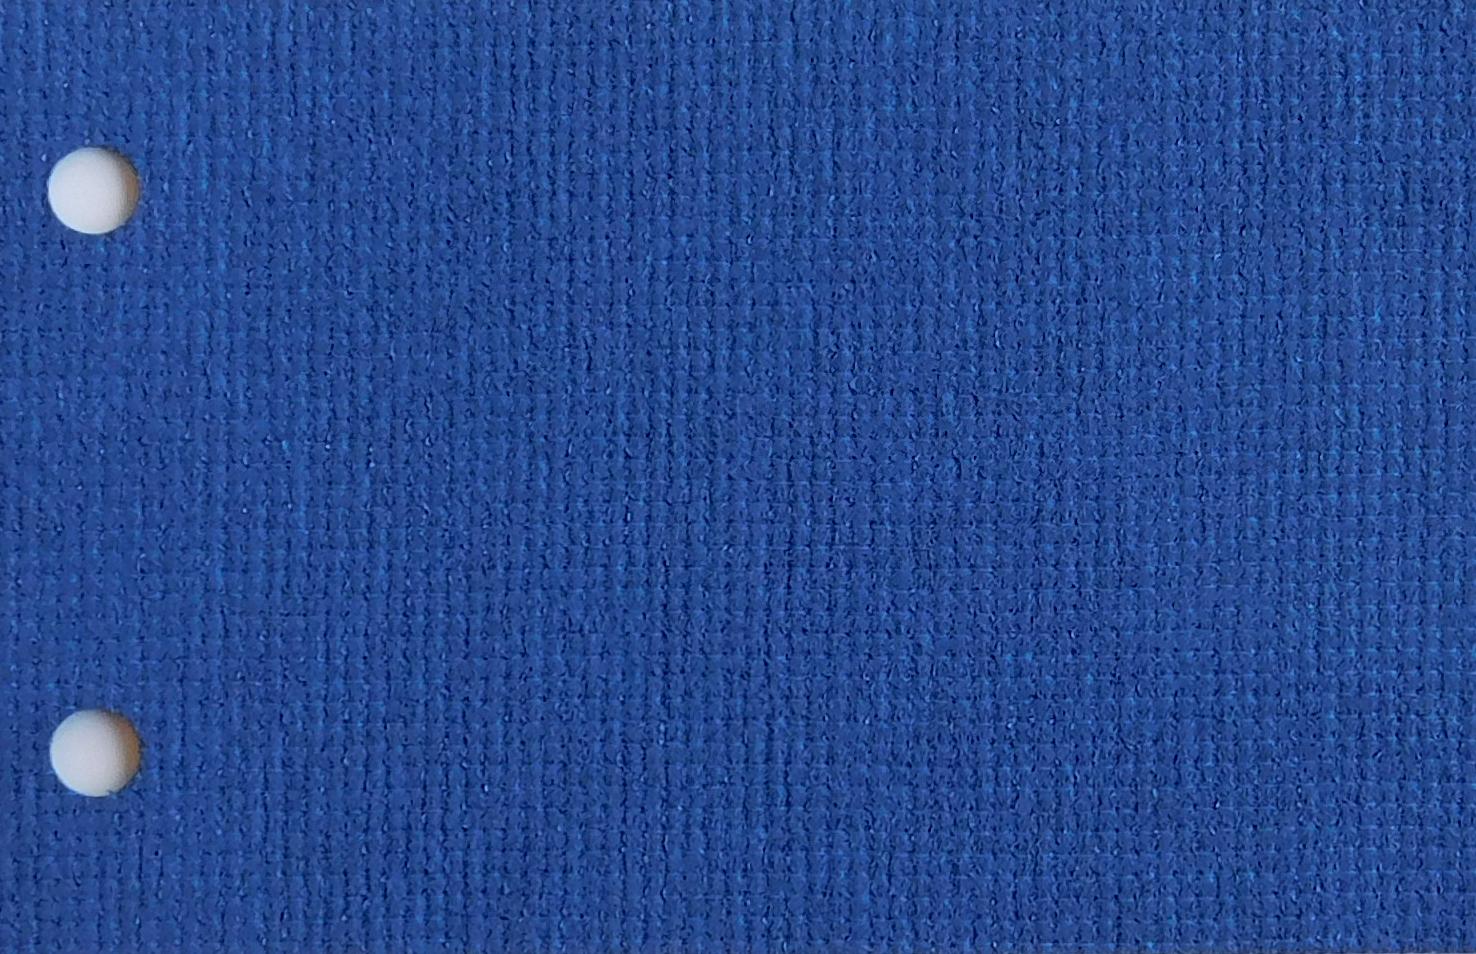 Guardian Royal Blind fabric